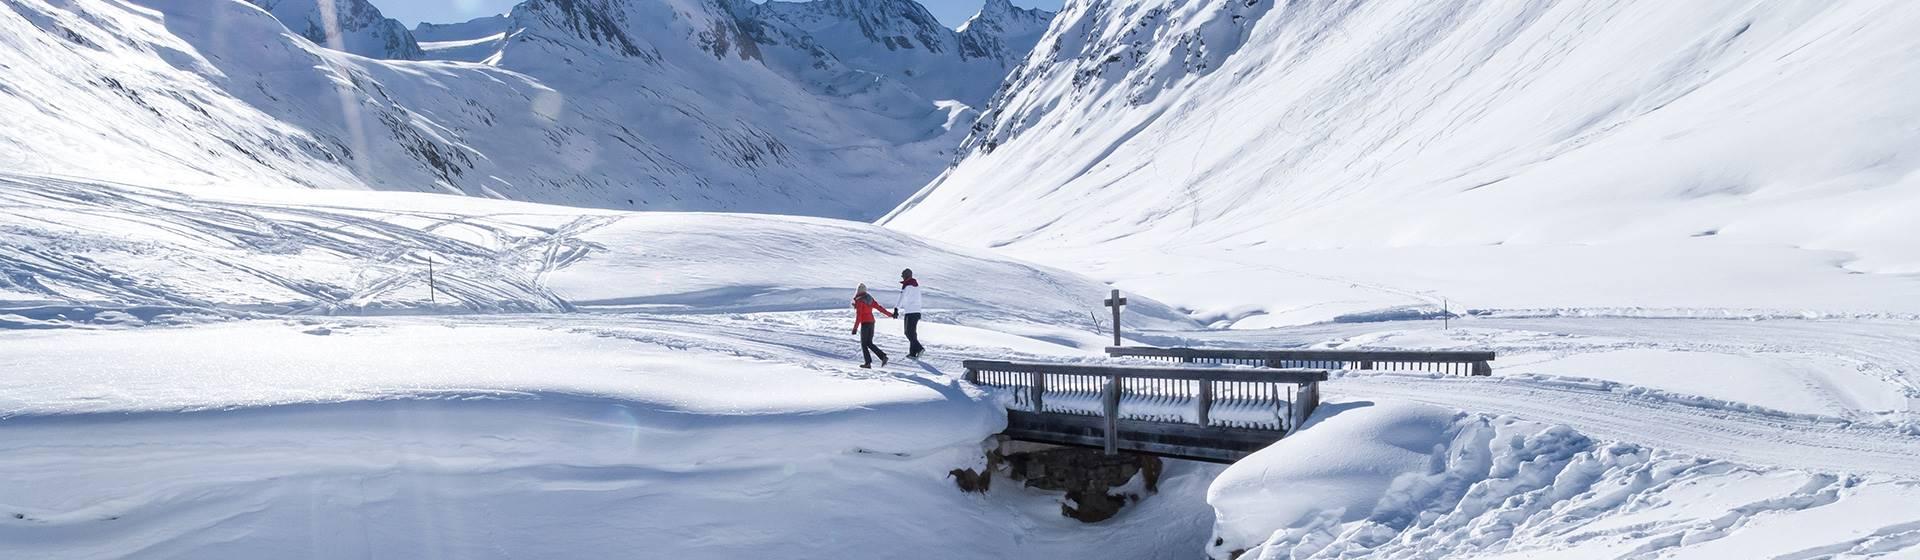 Couple hikes in winter landscape towards Schönwies hut